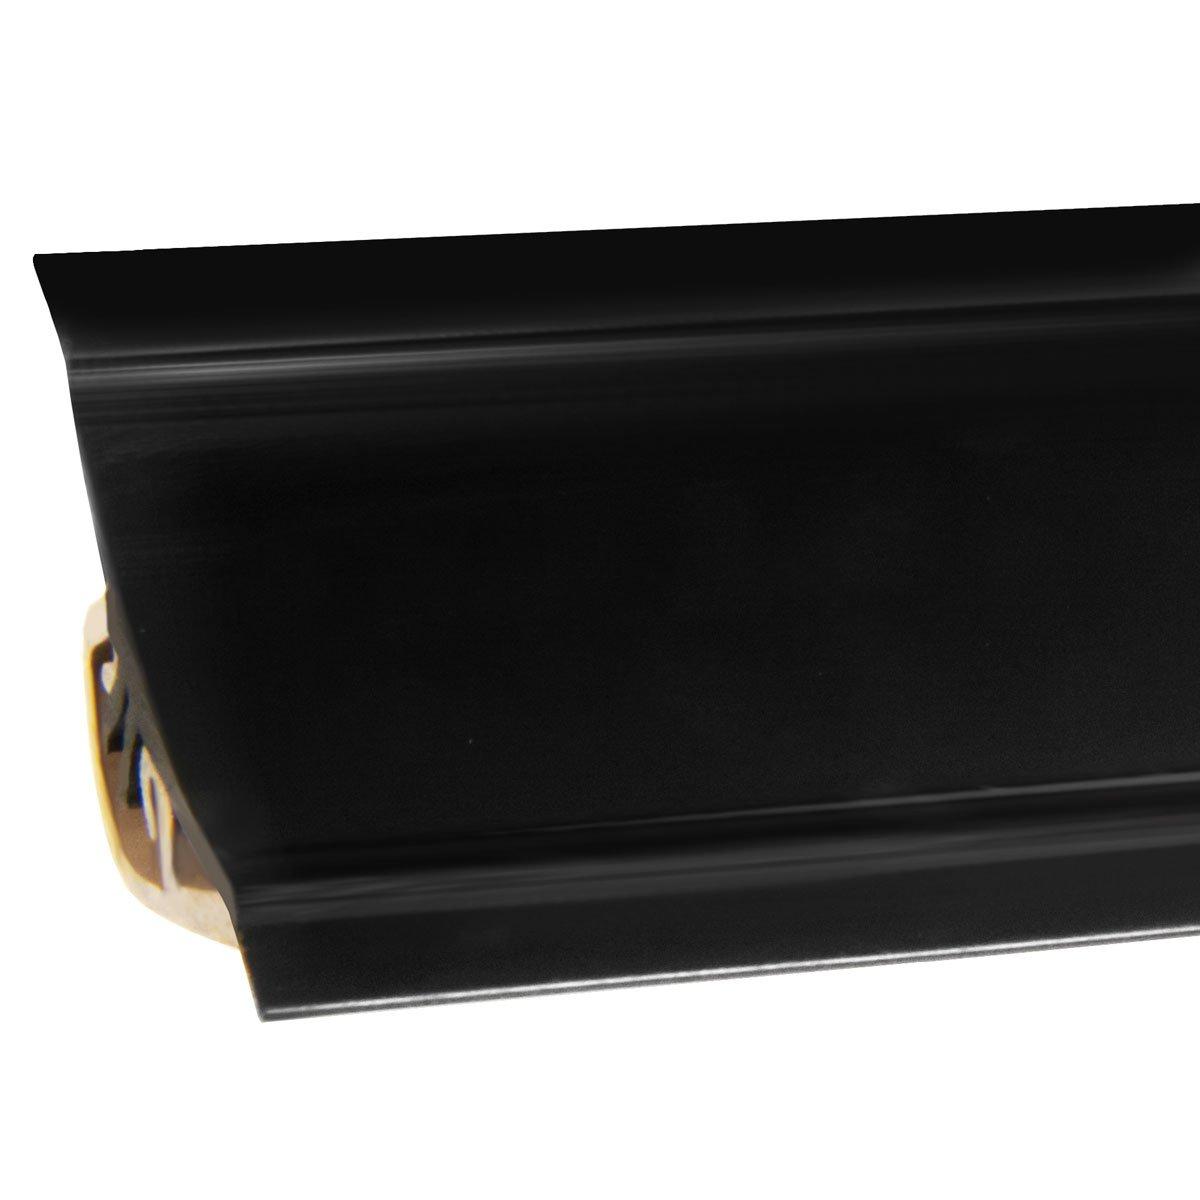 HOLZBRINK Copete de Encimera Negro Embellecedor de Remate PVC List/ón de Encimeras 23x23 mm 150 cm